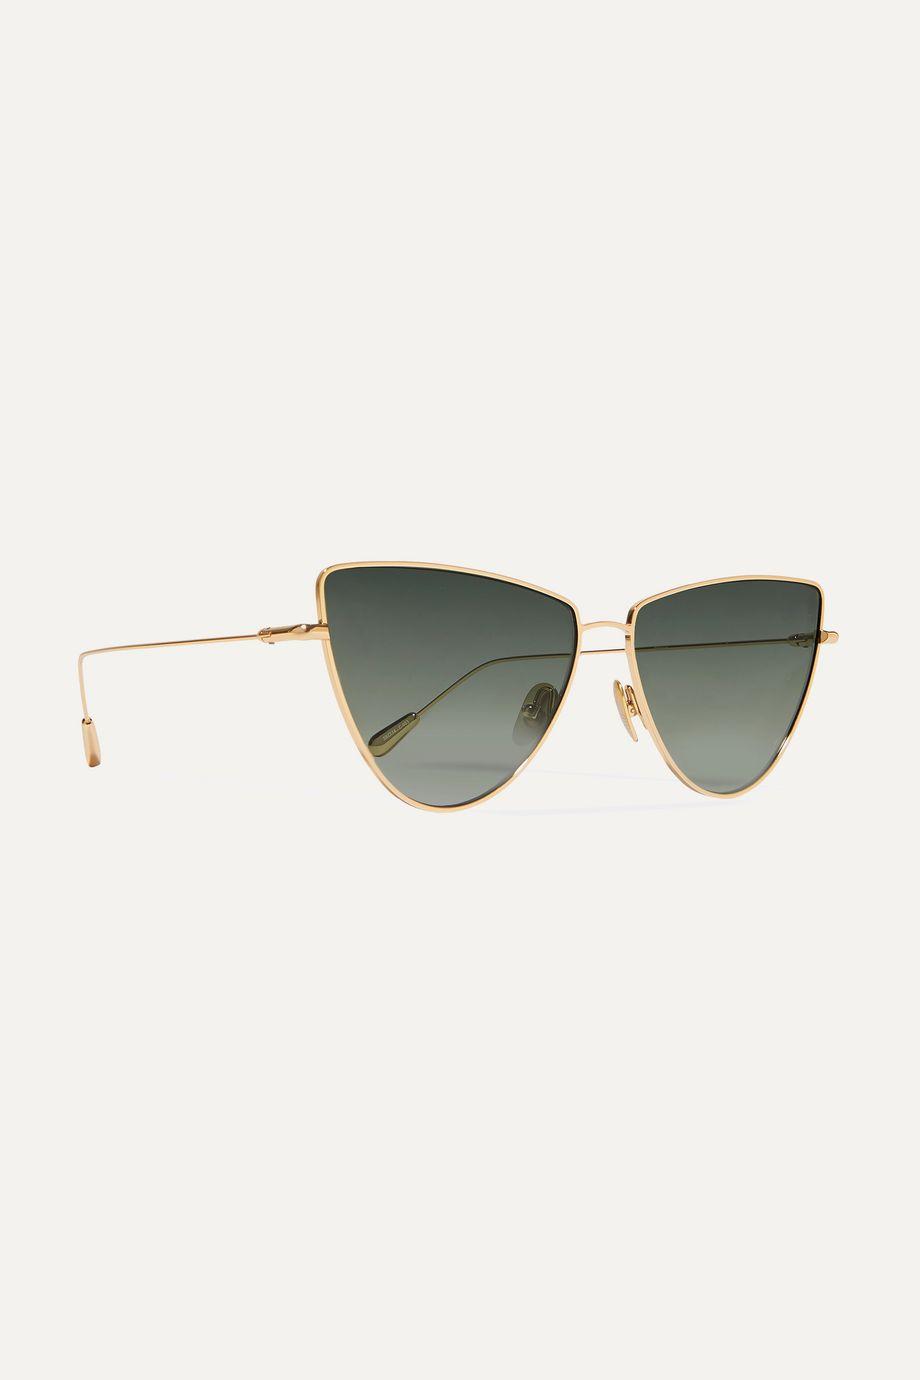 Kaleos Dolan cat-eye gold-tone sunglasses